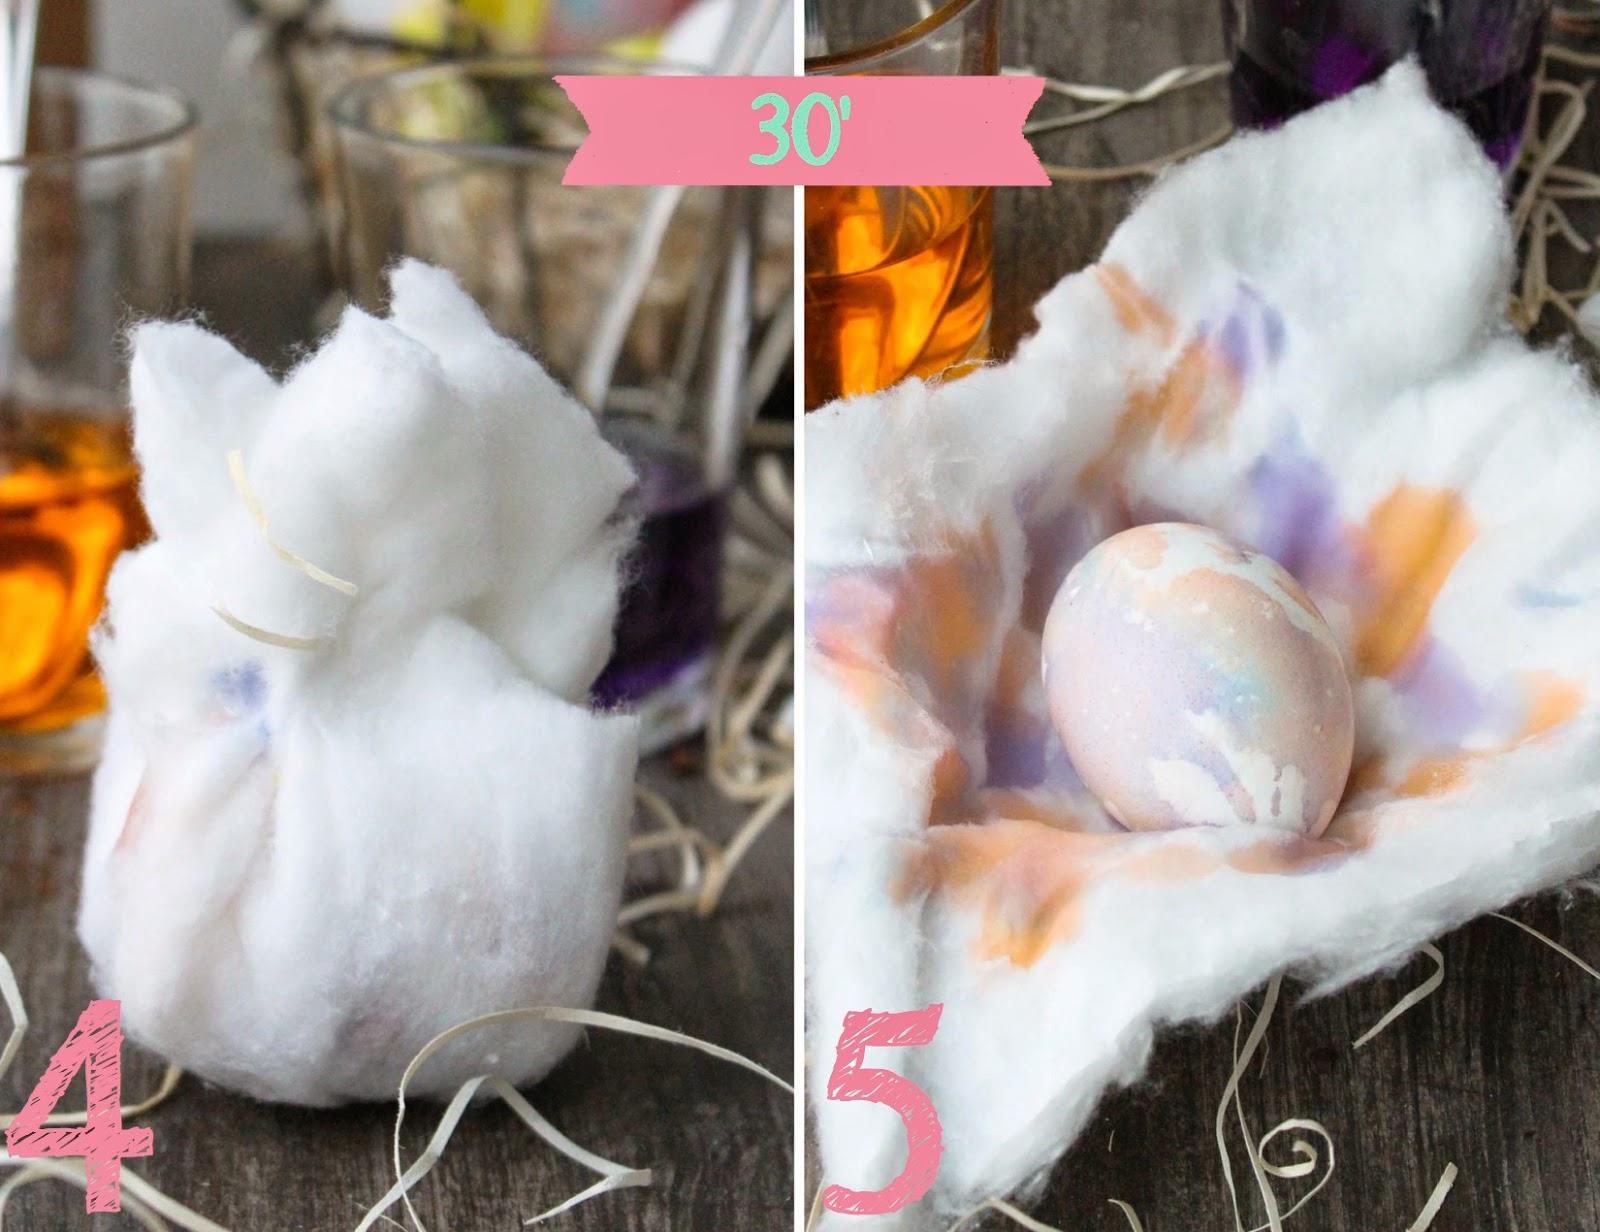 Cómo pintar huevos de pascua